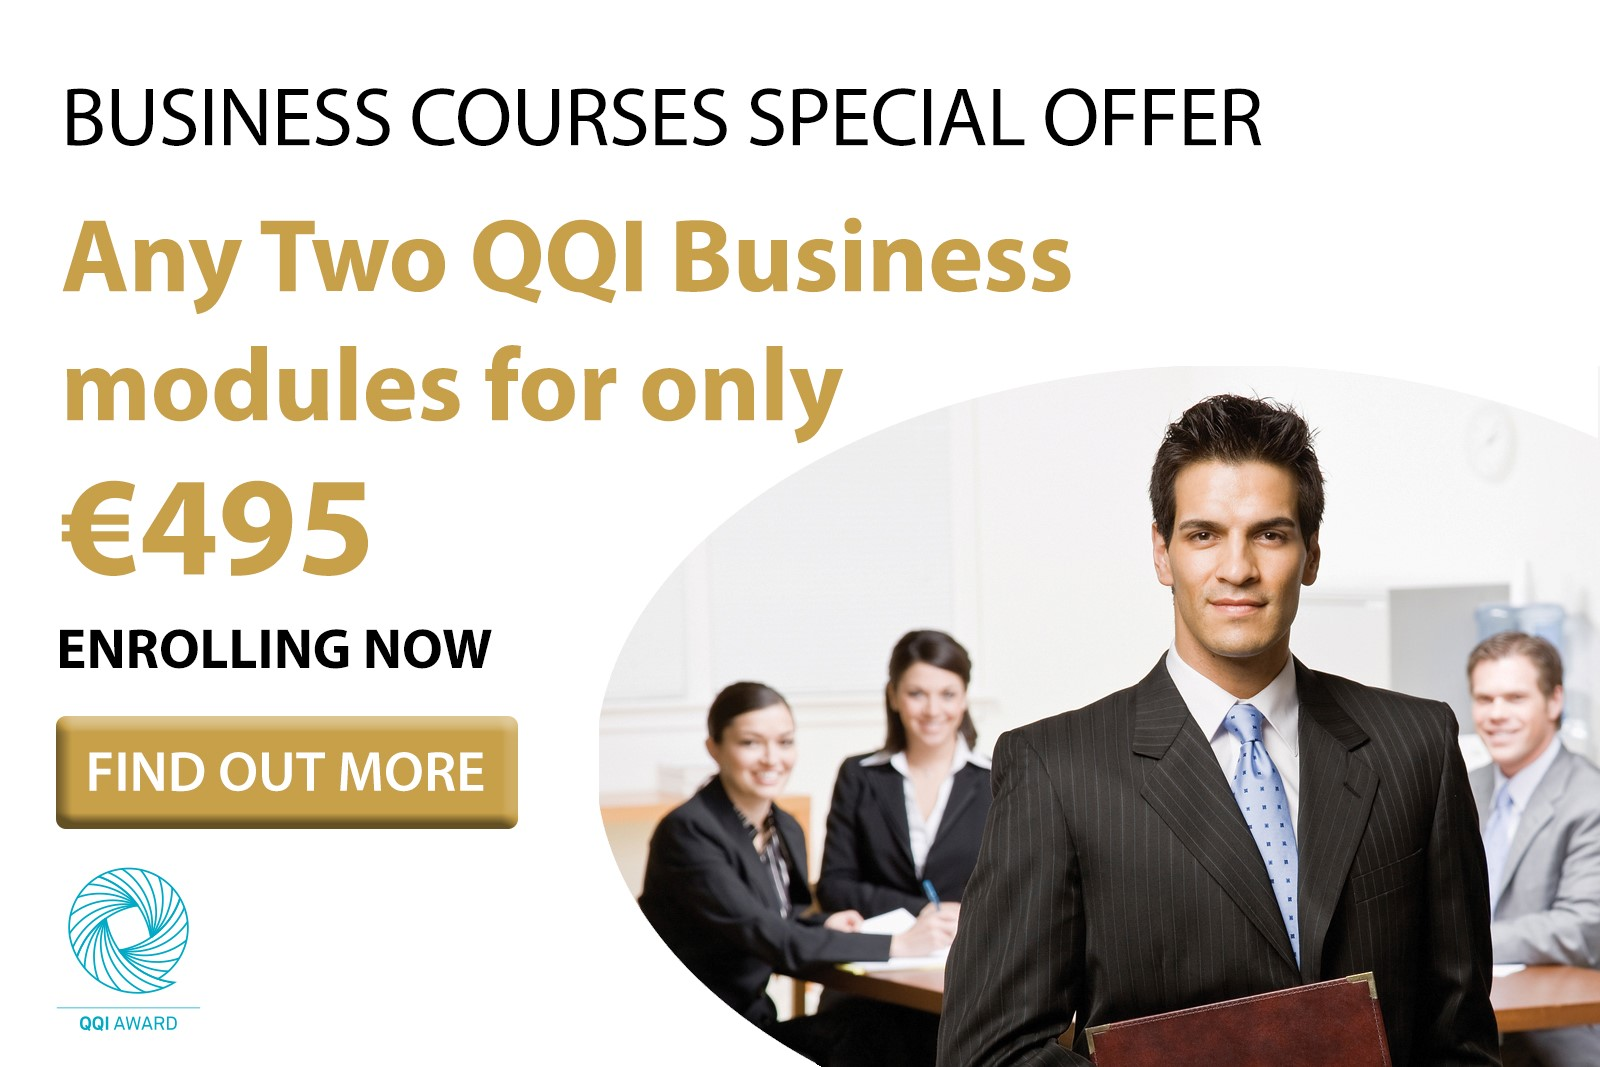 QQI Business & Finance Courses - July Bundle Offer